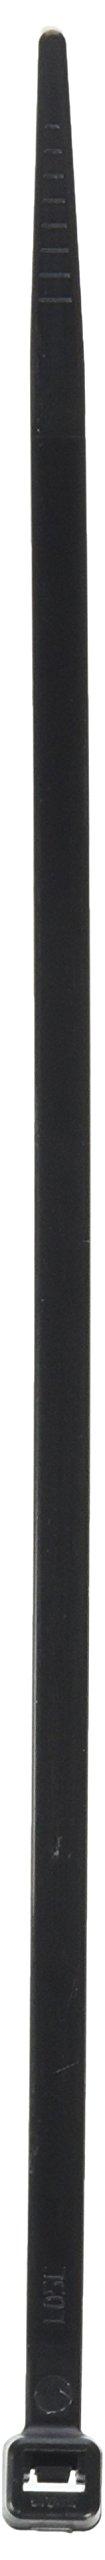 Pro Tie B8SD100 8-Inch Standard Duty Cable Tie, UV Black Nylon, 100-Pack